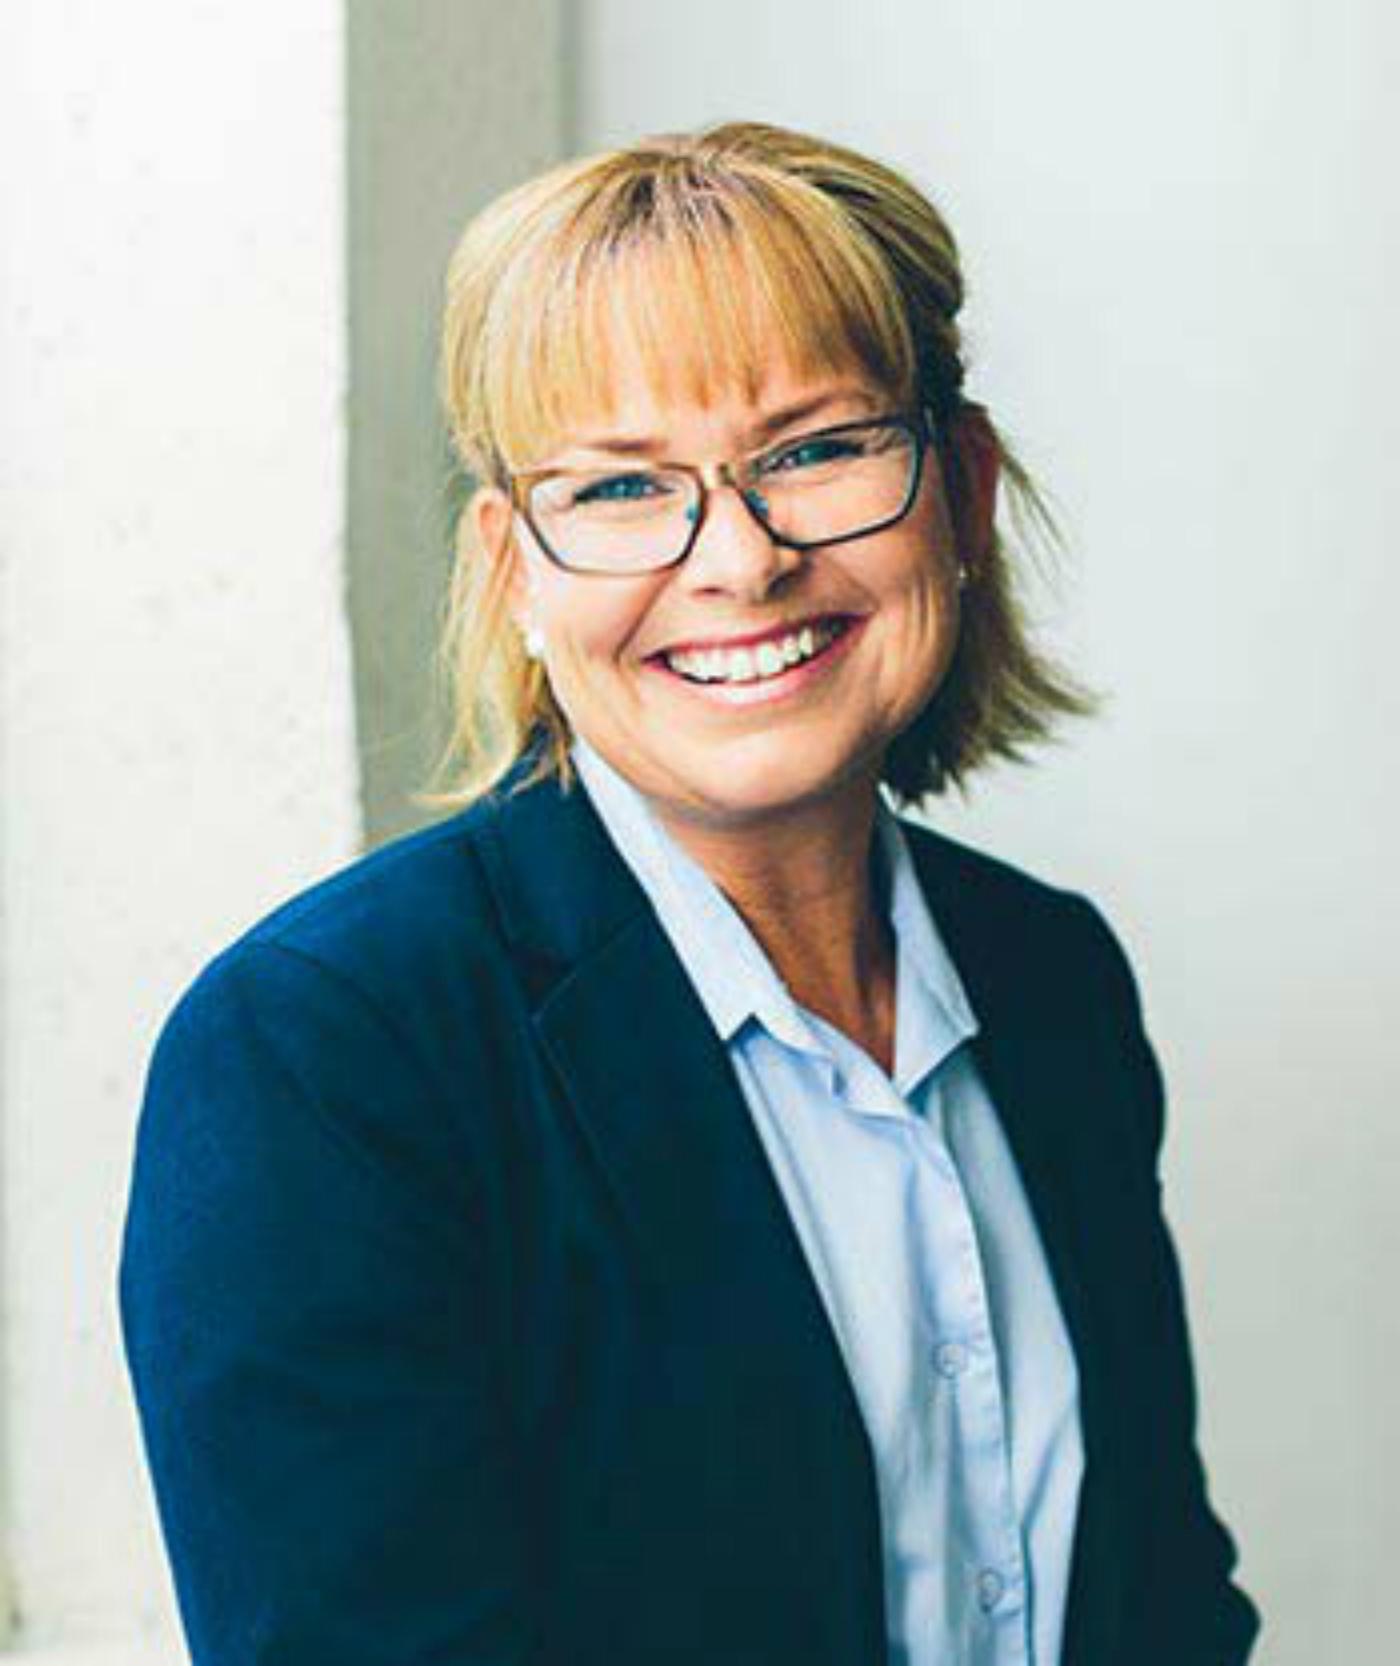 Camilla Bengtsson